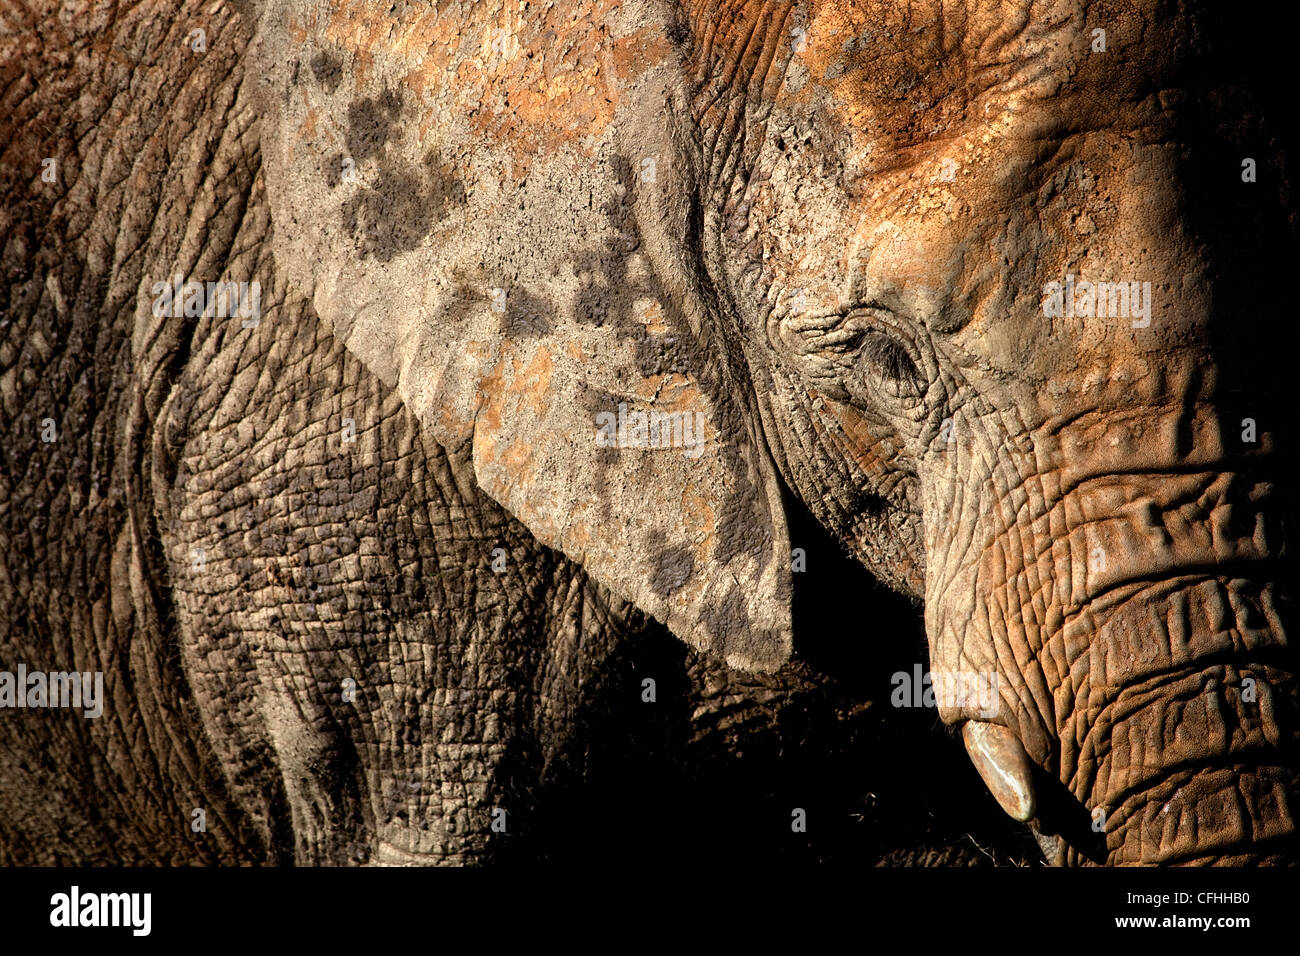 African elephant portrait, Cabarceno, Spain Stock Photo